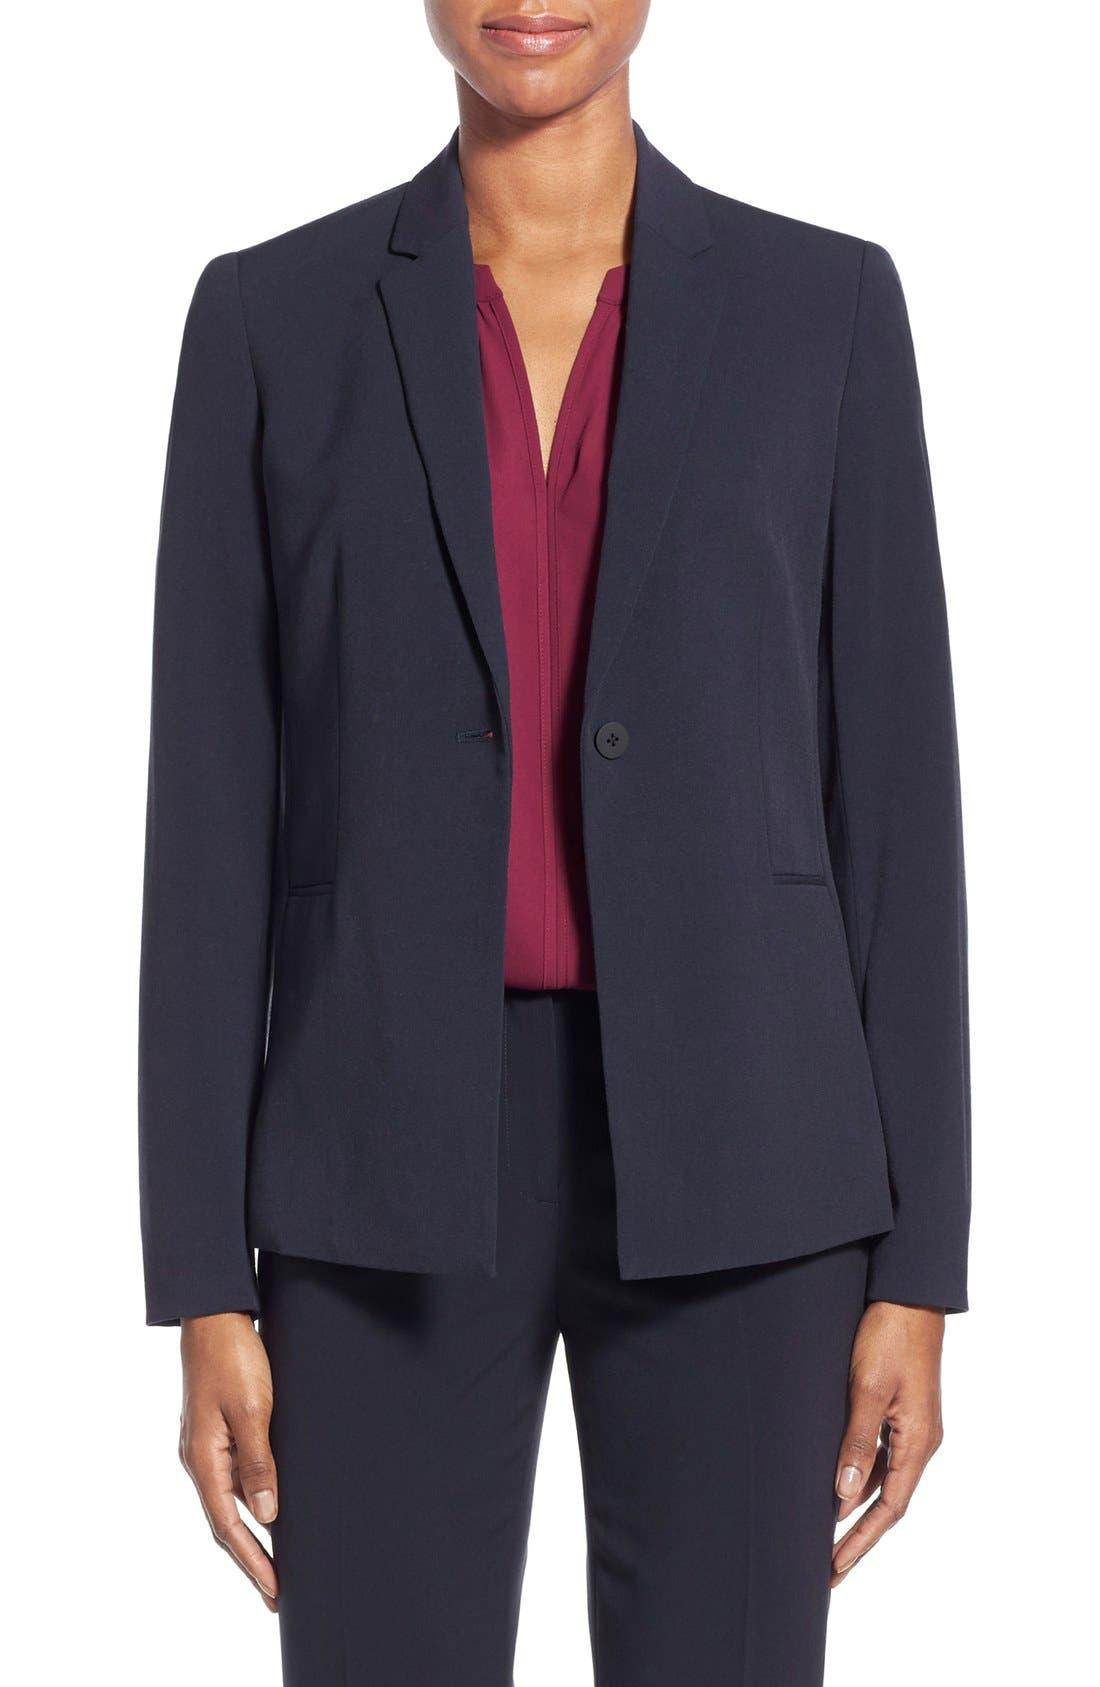 Alternate Image 1 Selected - T Tahari Jolie Stretch Woven Suit Jacket